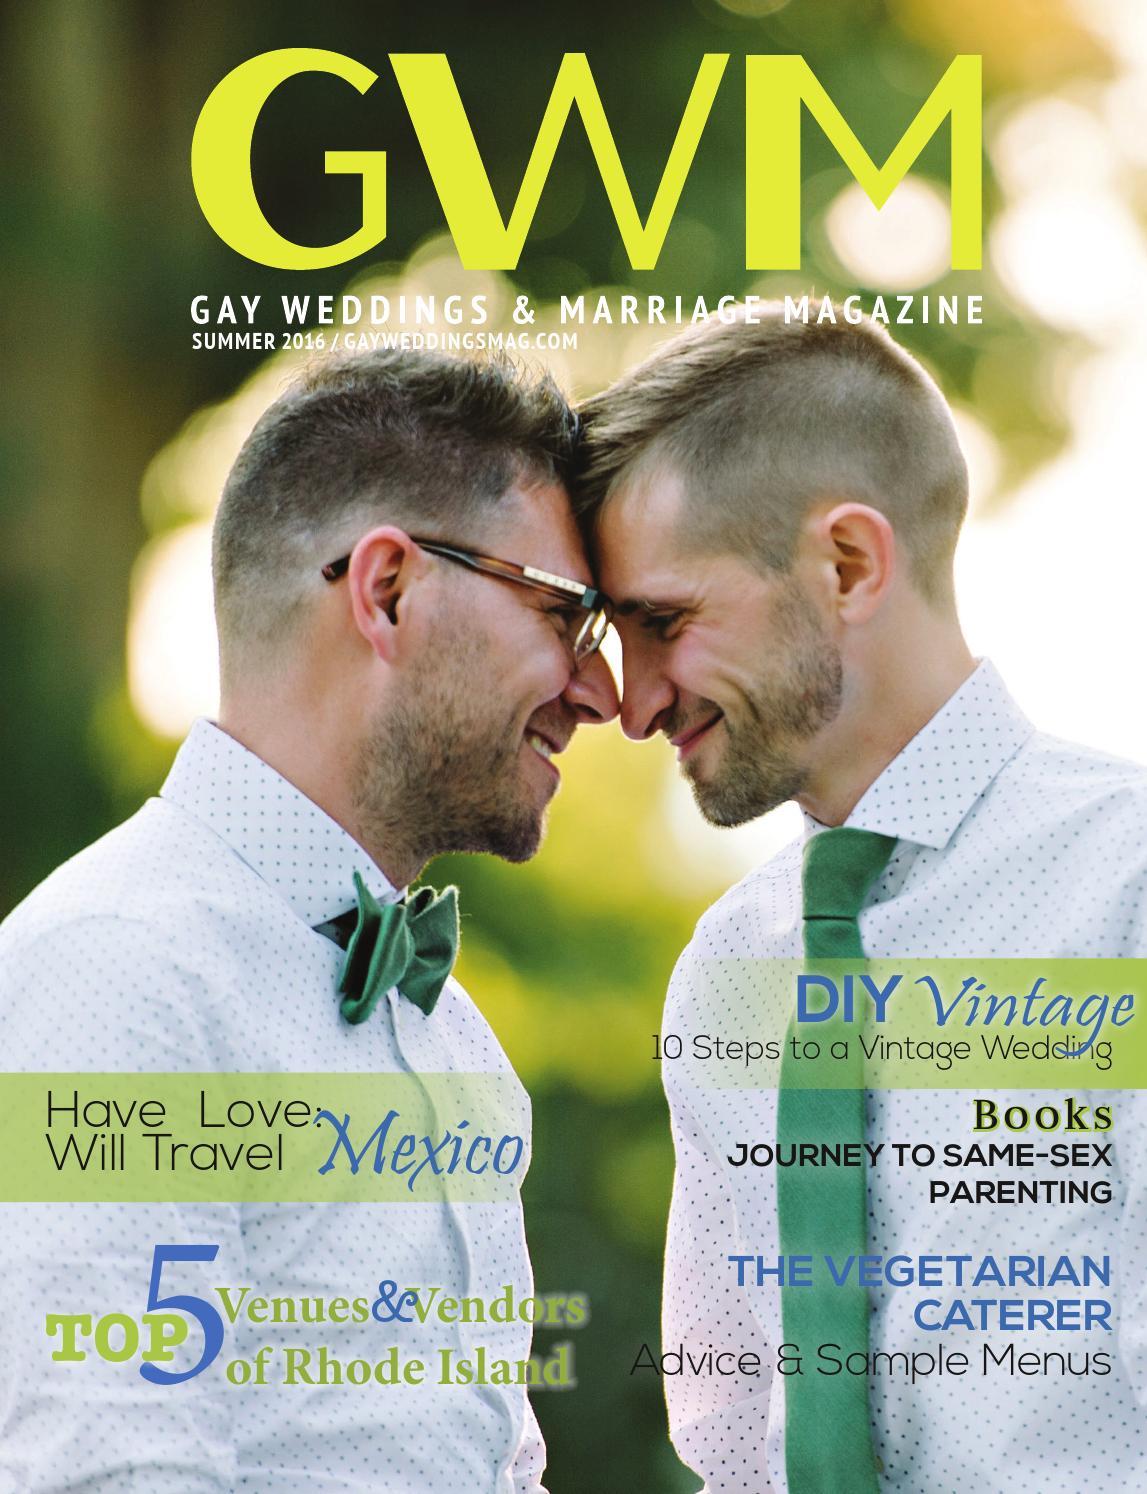 Opinion men sex parent magazine